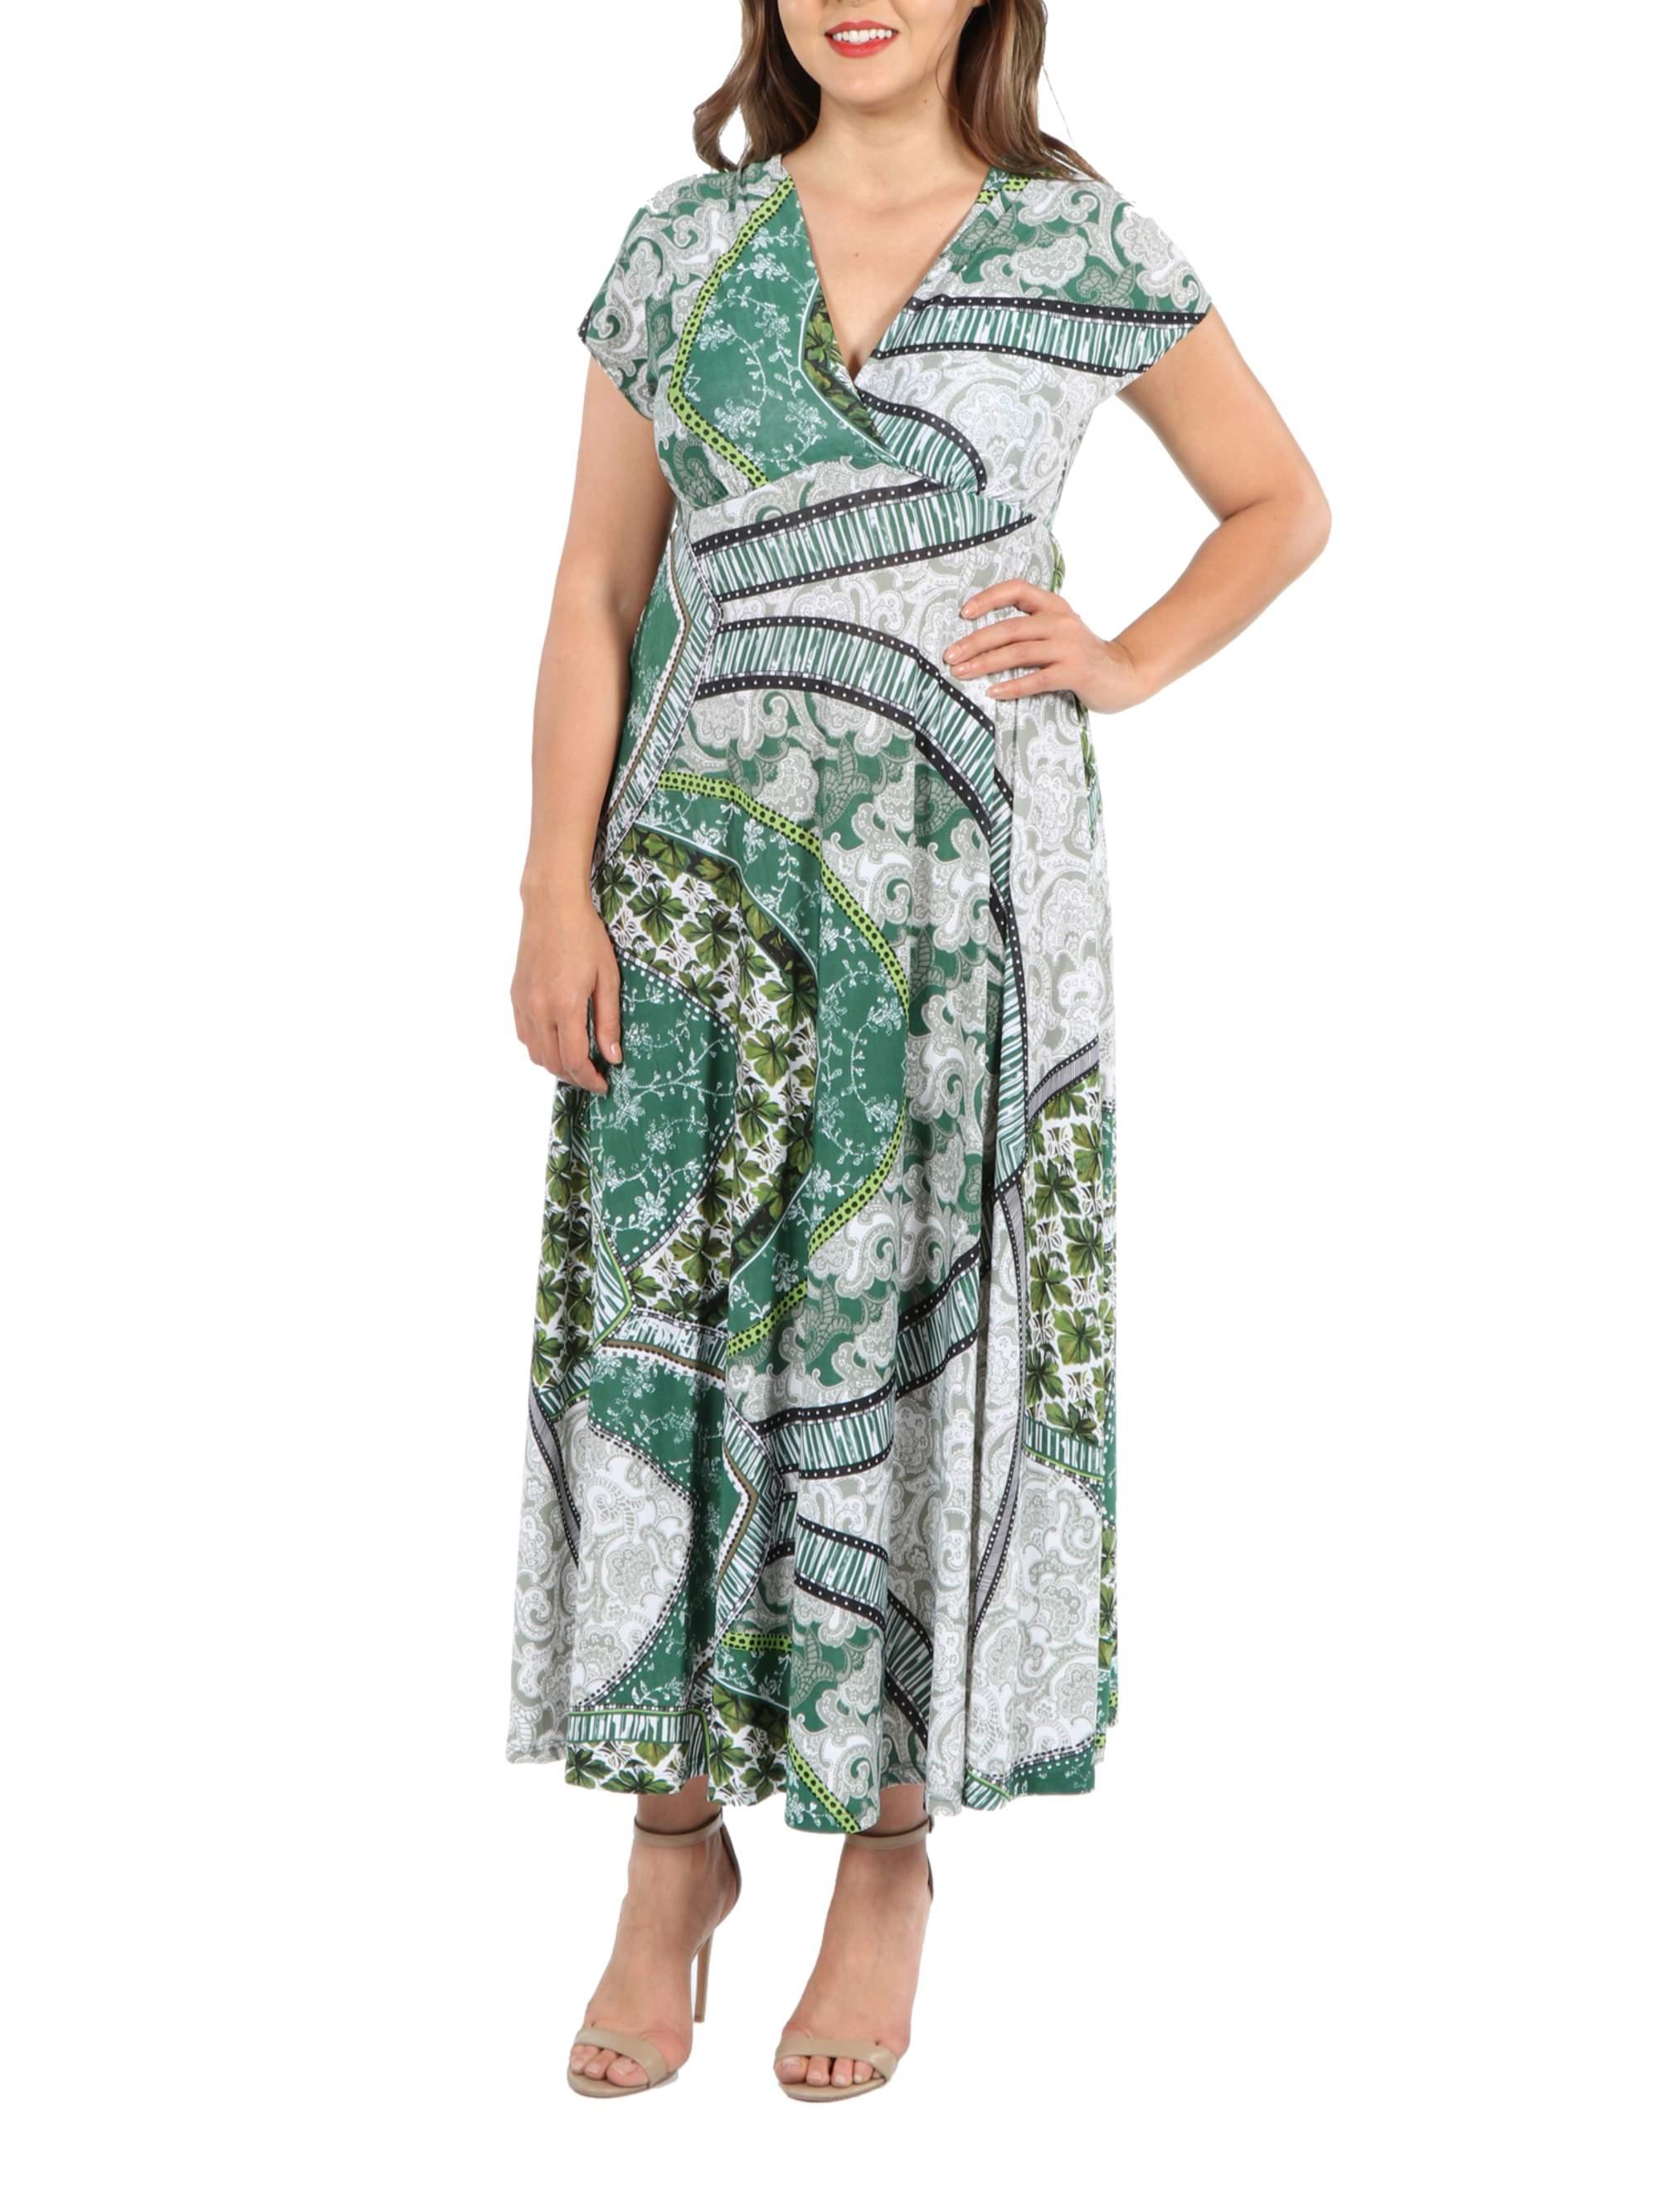 24Seven Comfort Apparel Lena Short Sleeve Green Print Empire Waist Plus Size Maxi Dress